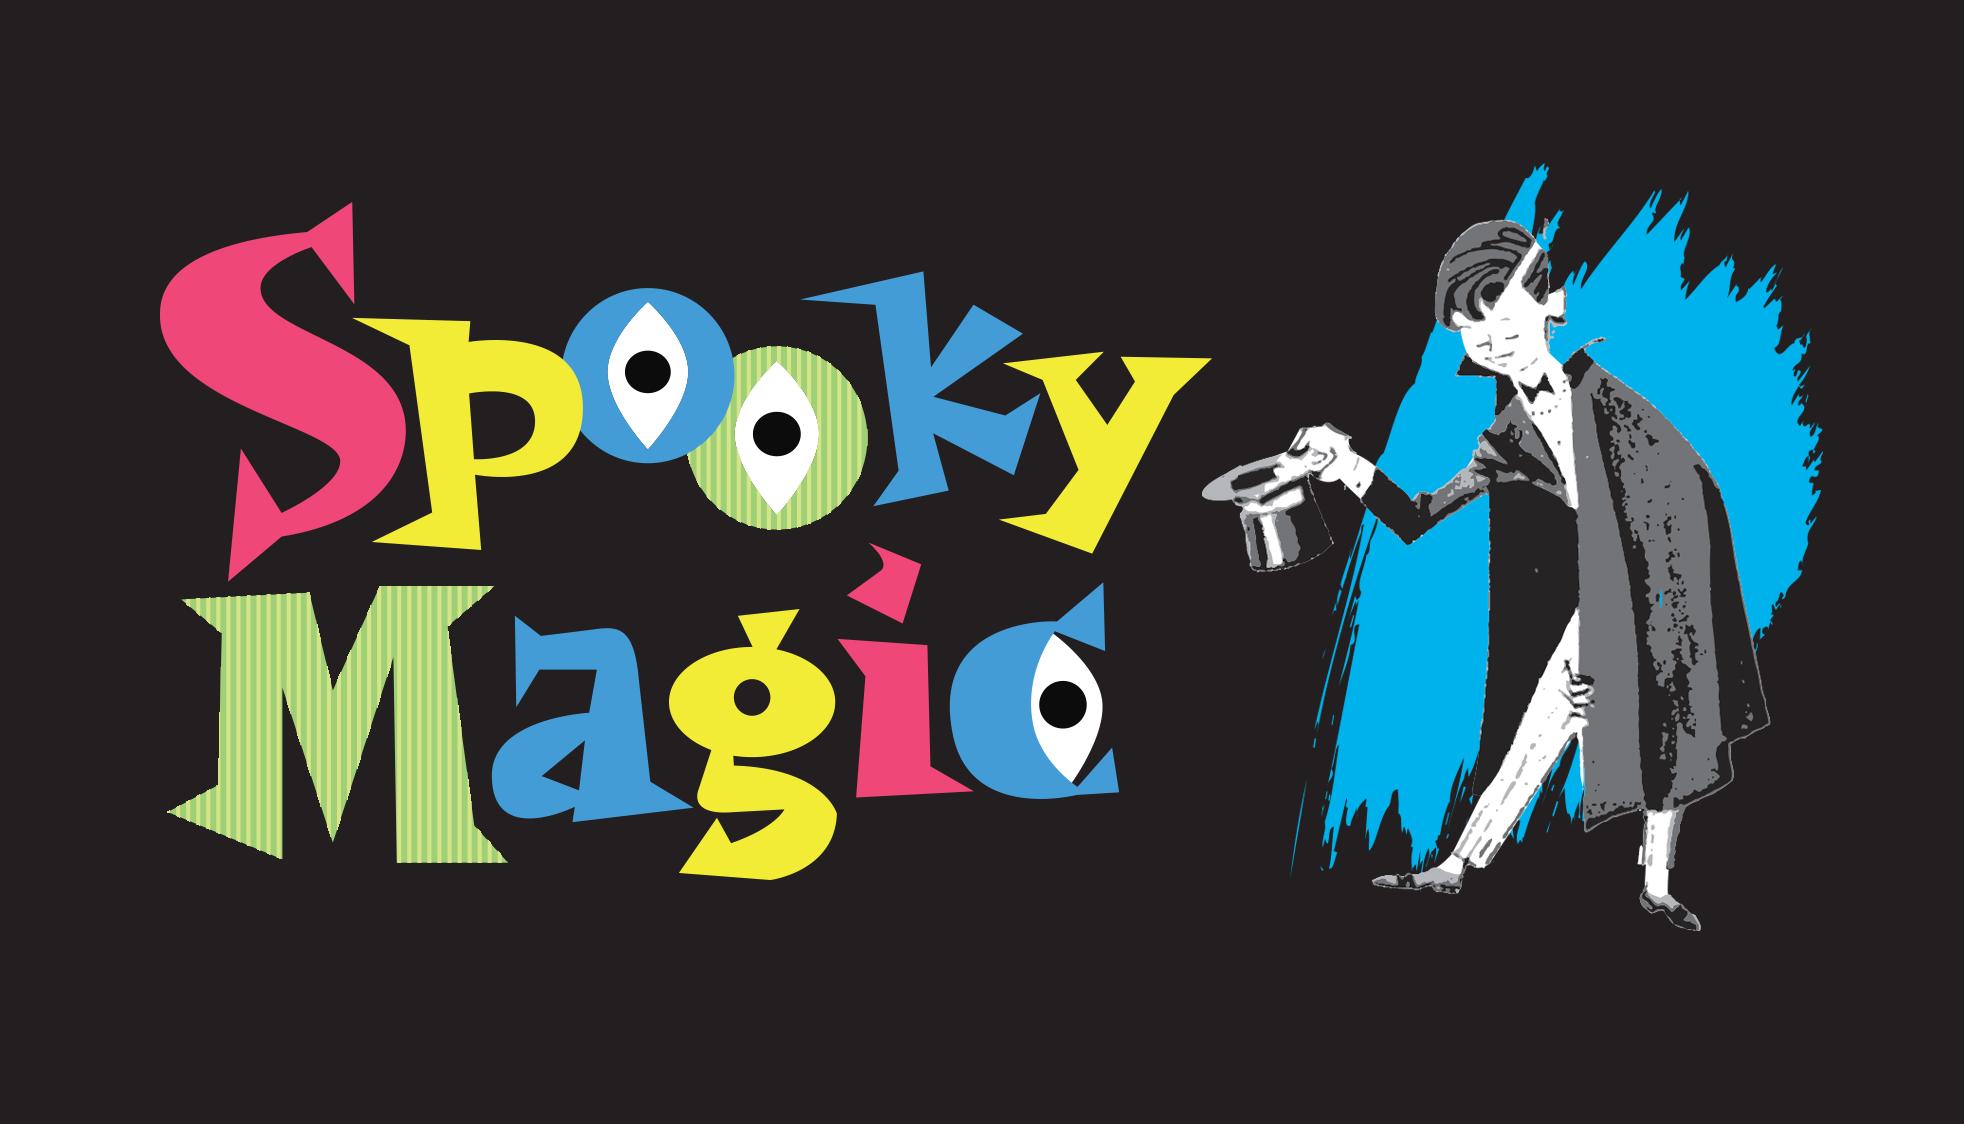 Download Spooky Magic cool free fonts